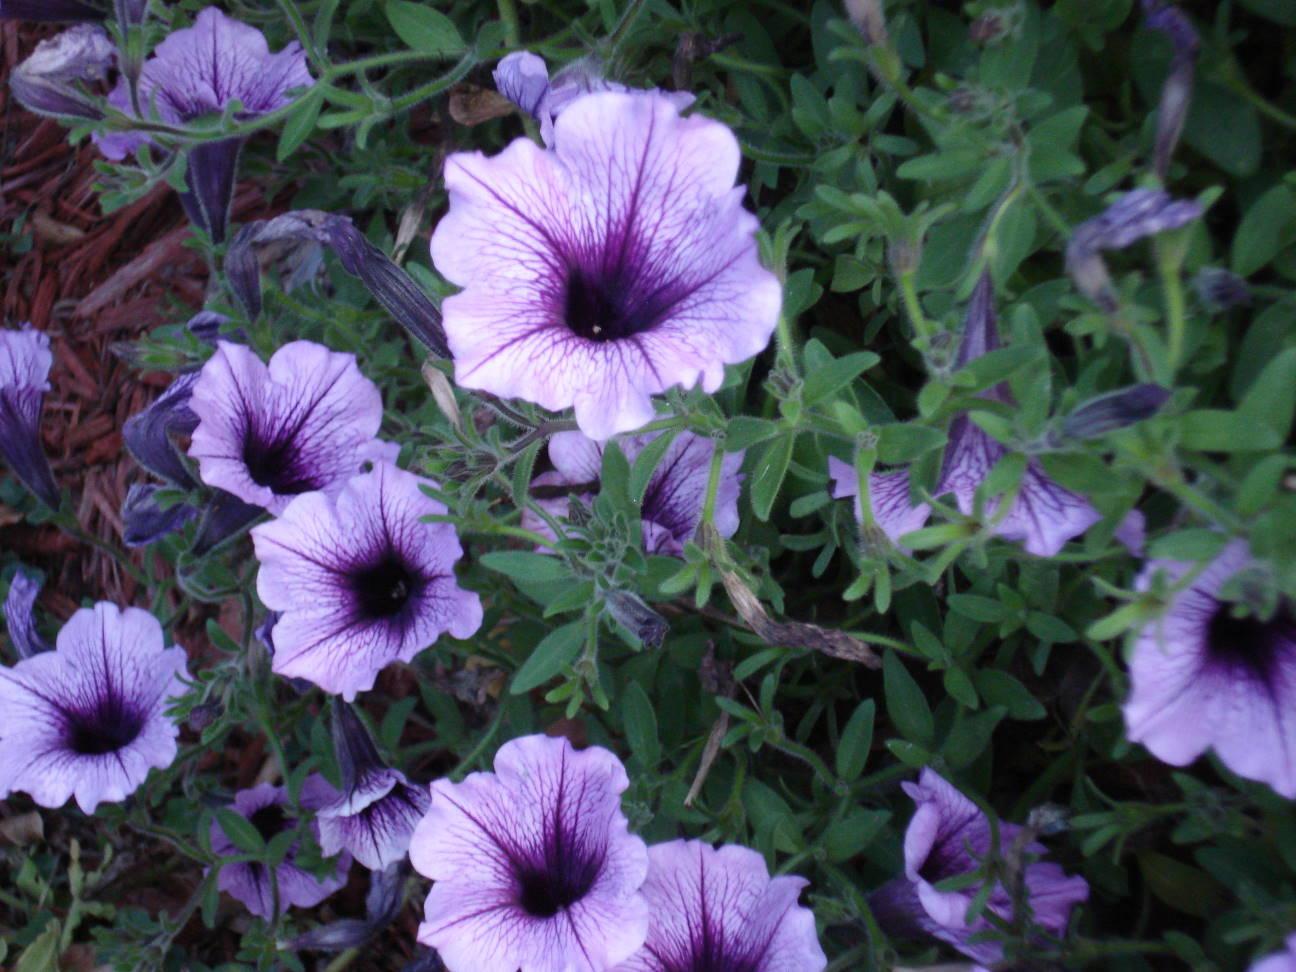 Purple petunias by Mary Warner, September 2015.